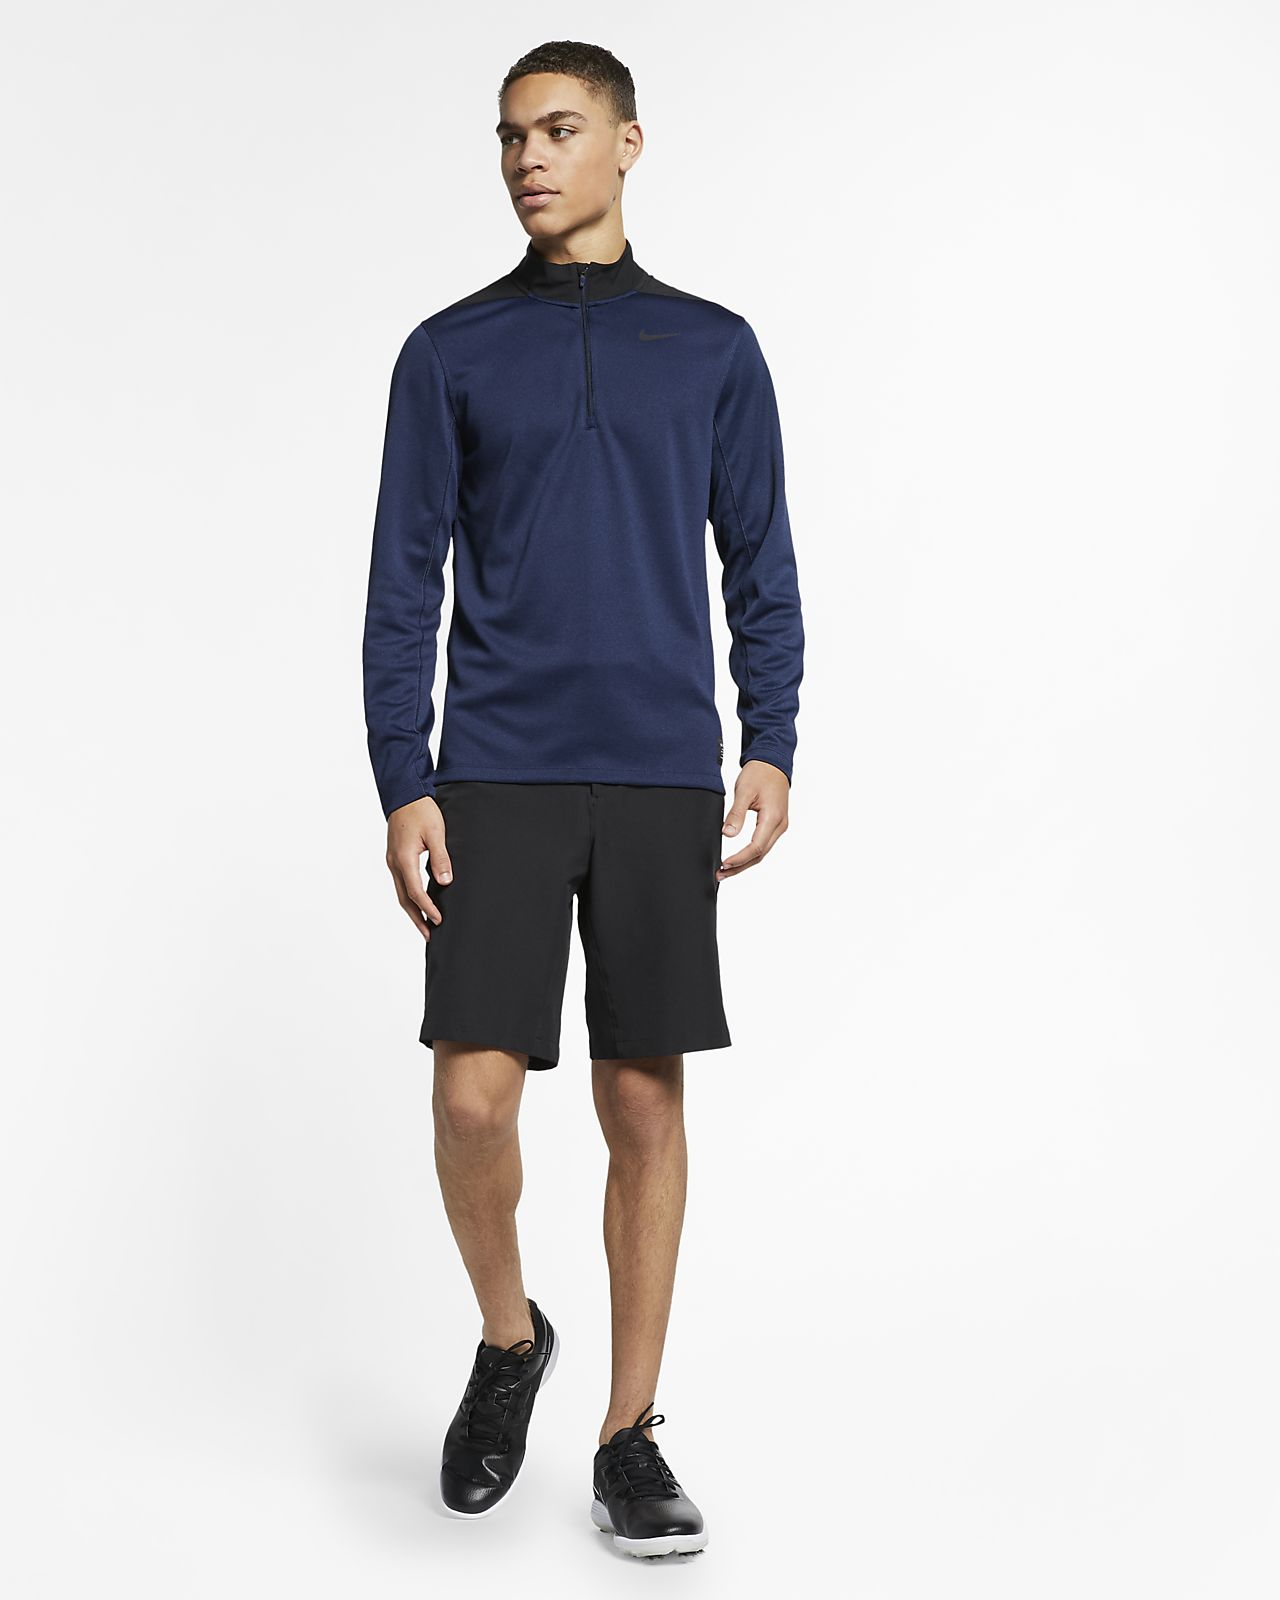 Nike Herren Dri-Fit Victory Poloshirt Black//Anthracite//Cool Grey L